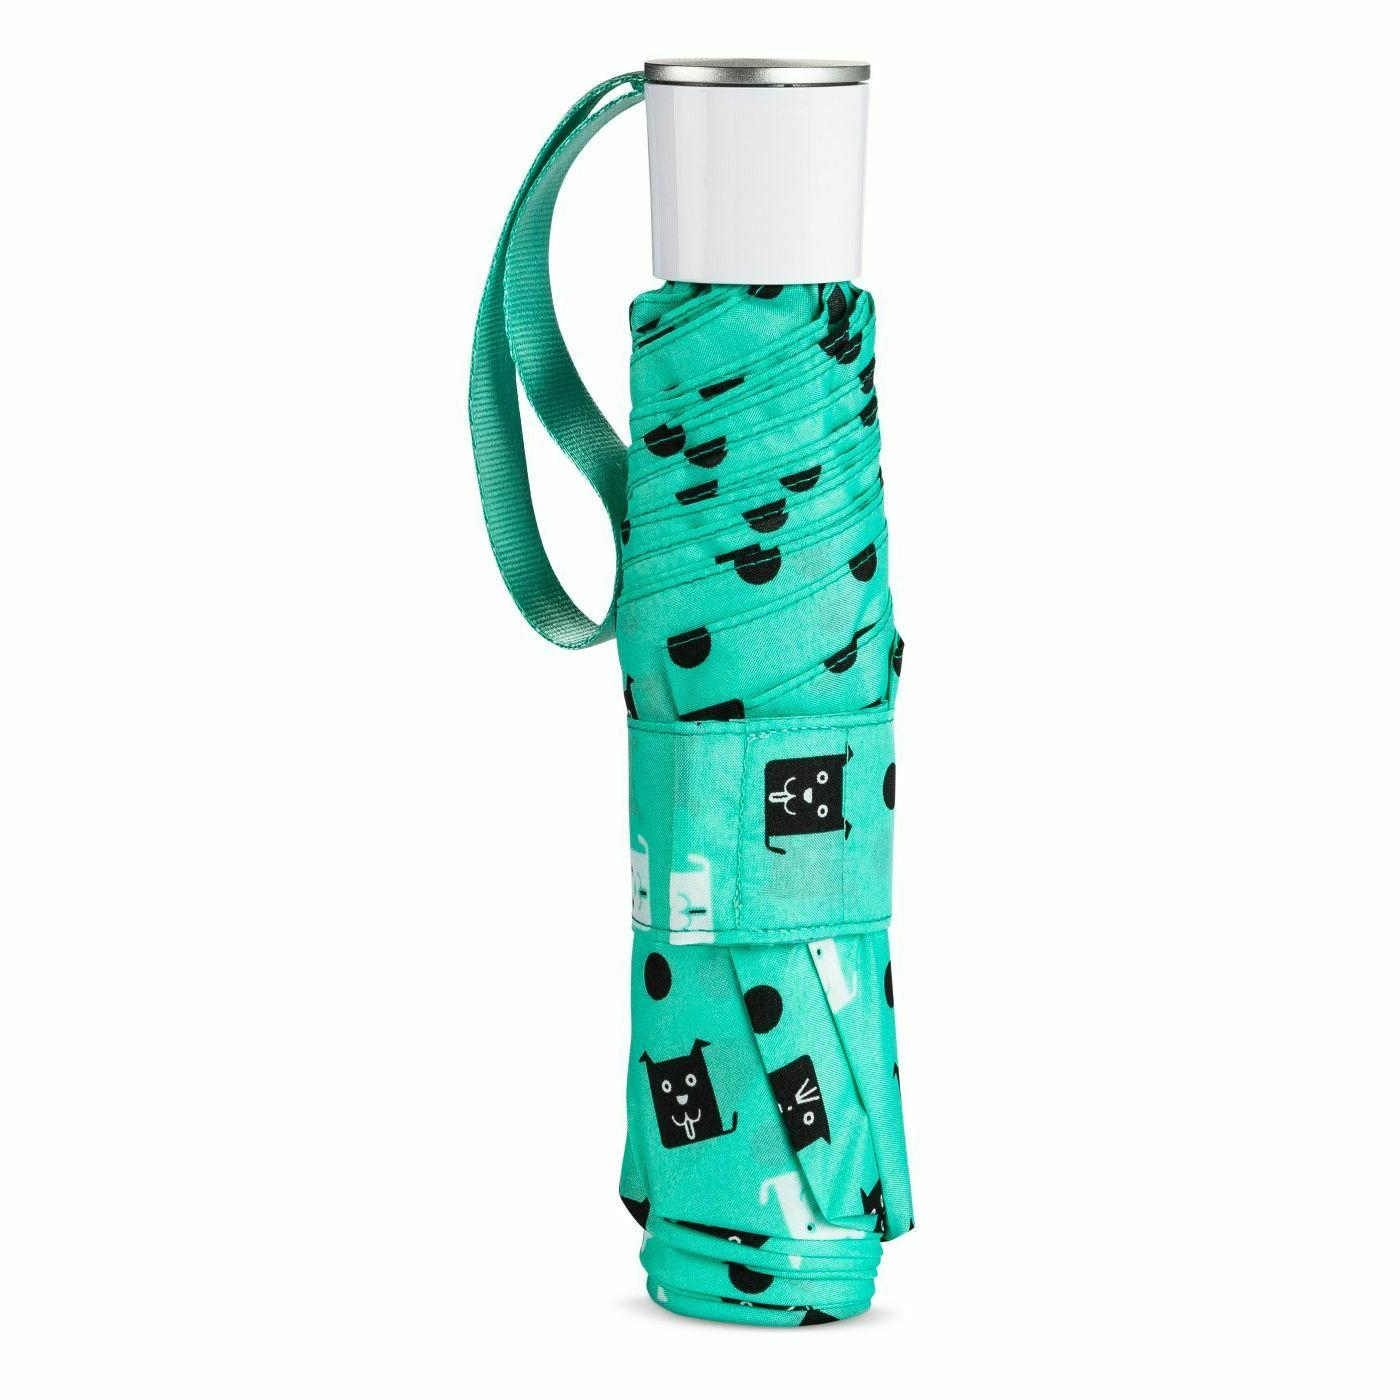 NEW Compact mint green Cirra pet theme